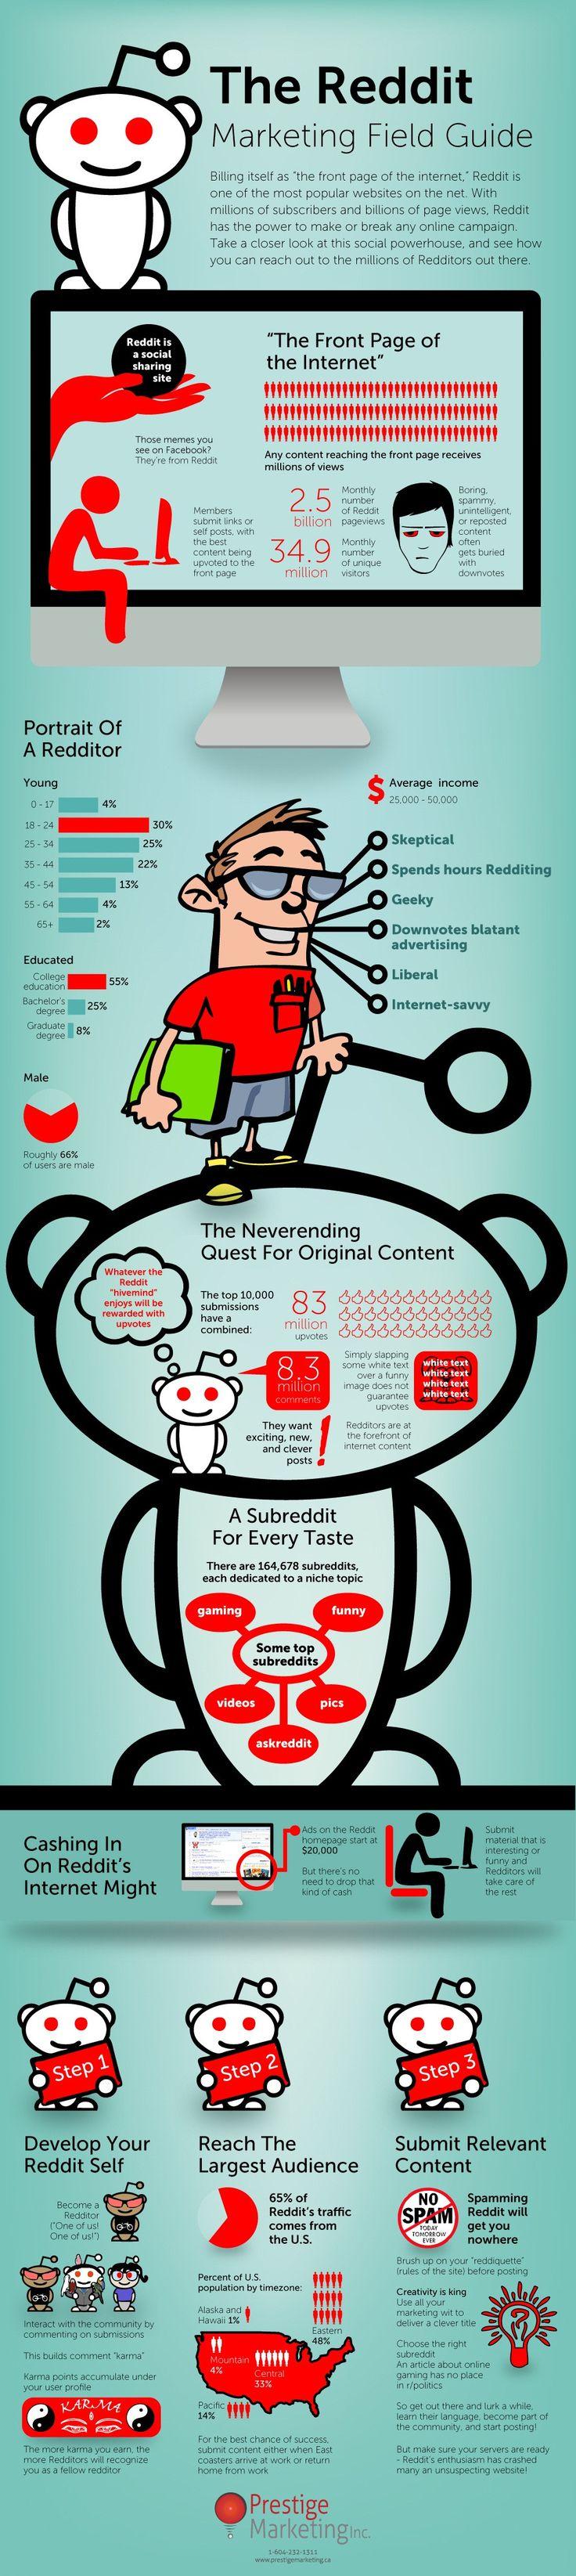 The #Reddit Marketing Field Guide #socialmedia